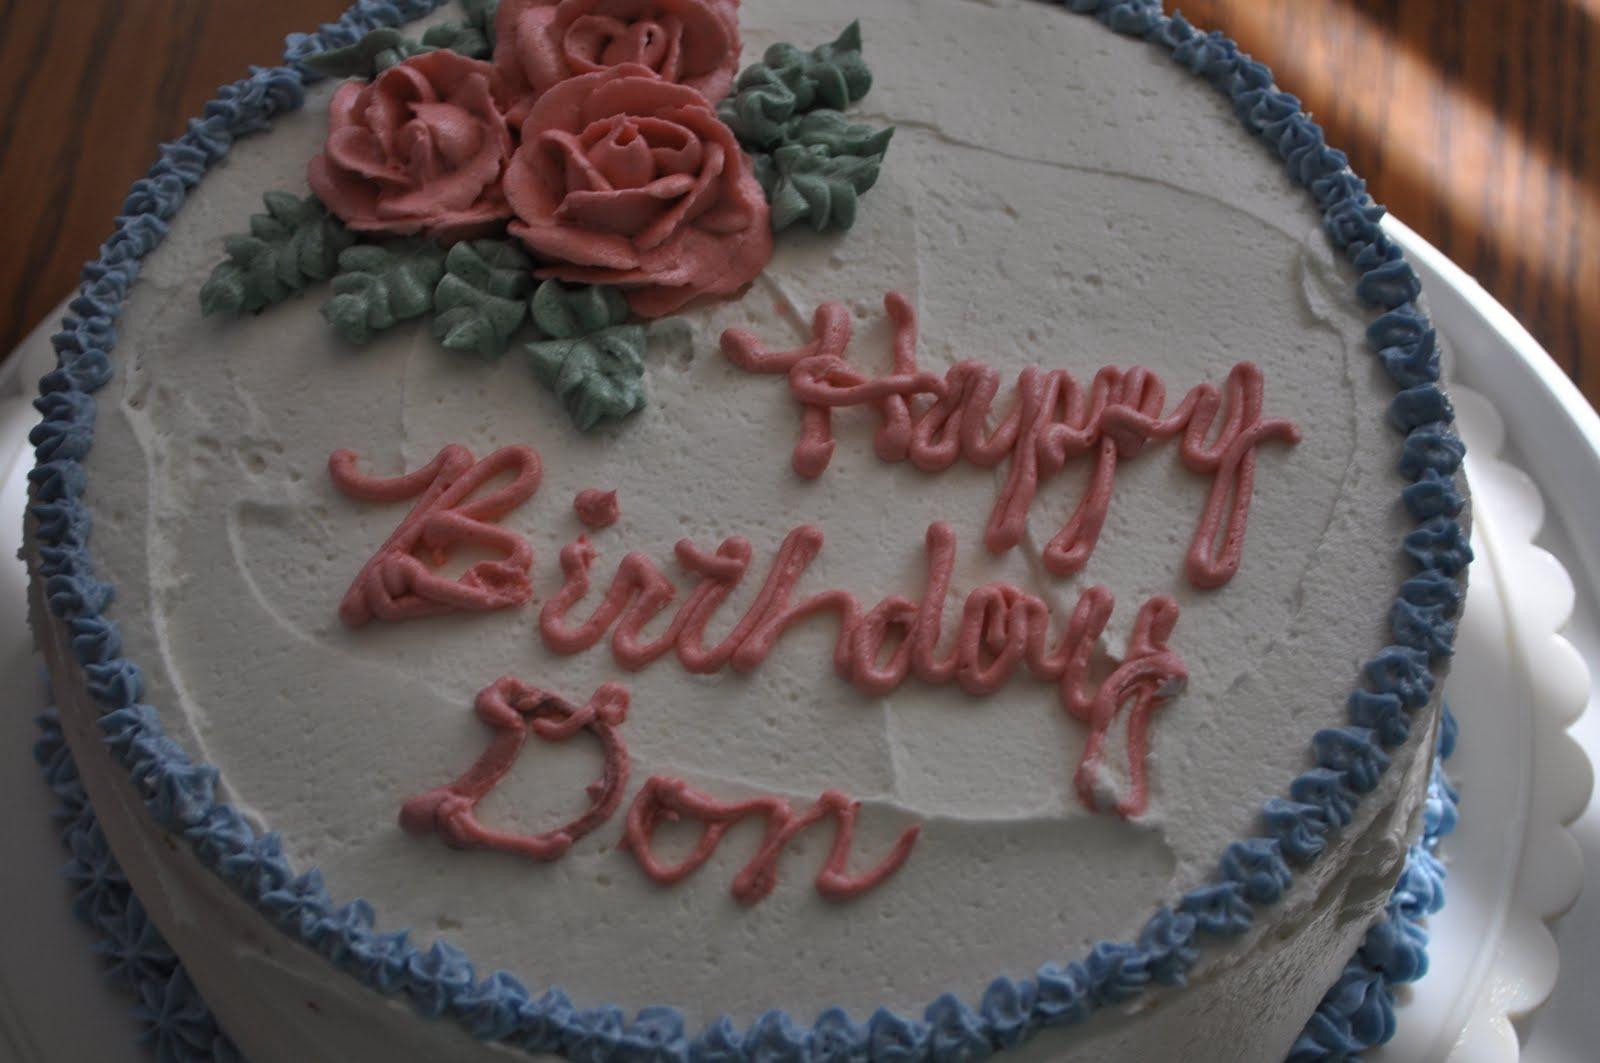 Cake Decorating Recipes : Beth s Favorite Recipes: Cake decorating frosting